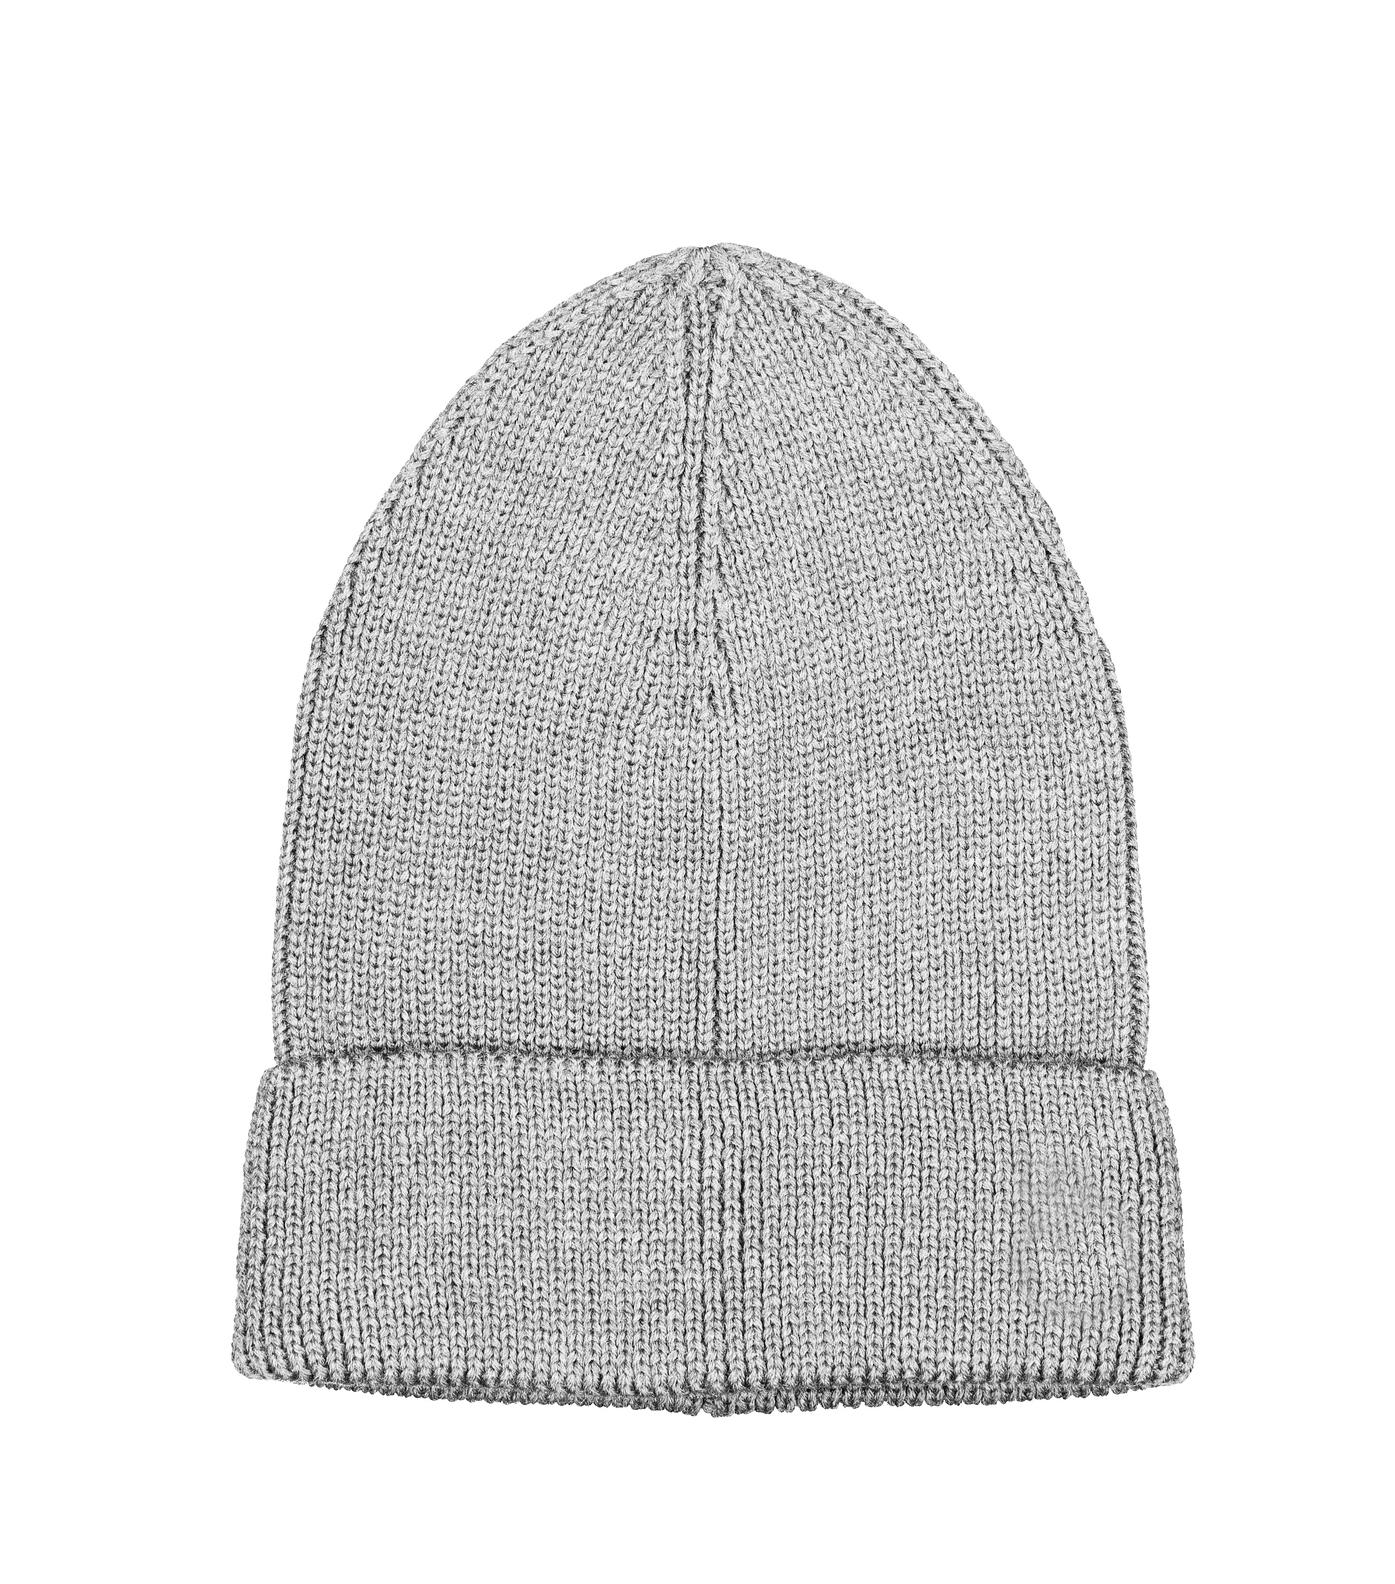 HAT ETOILE - Grey